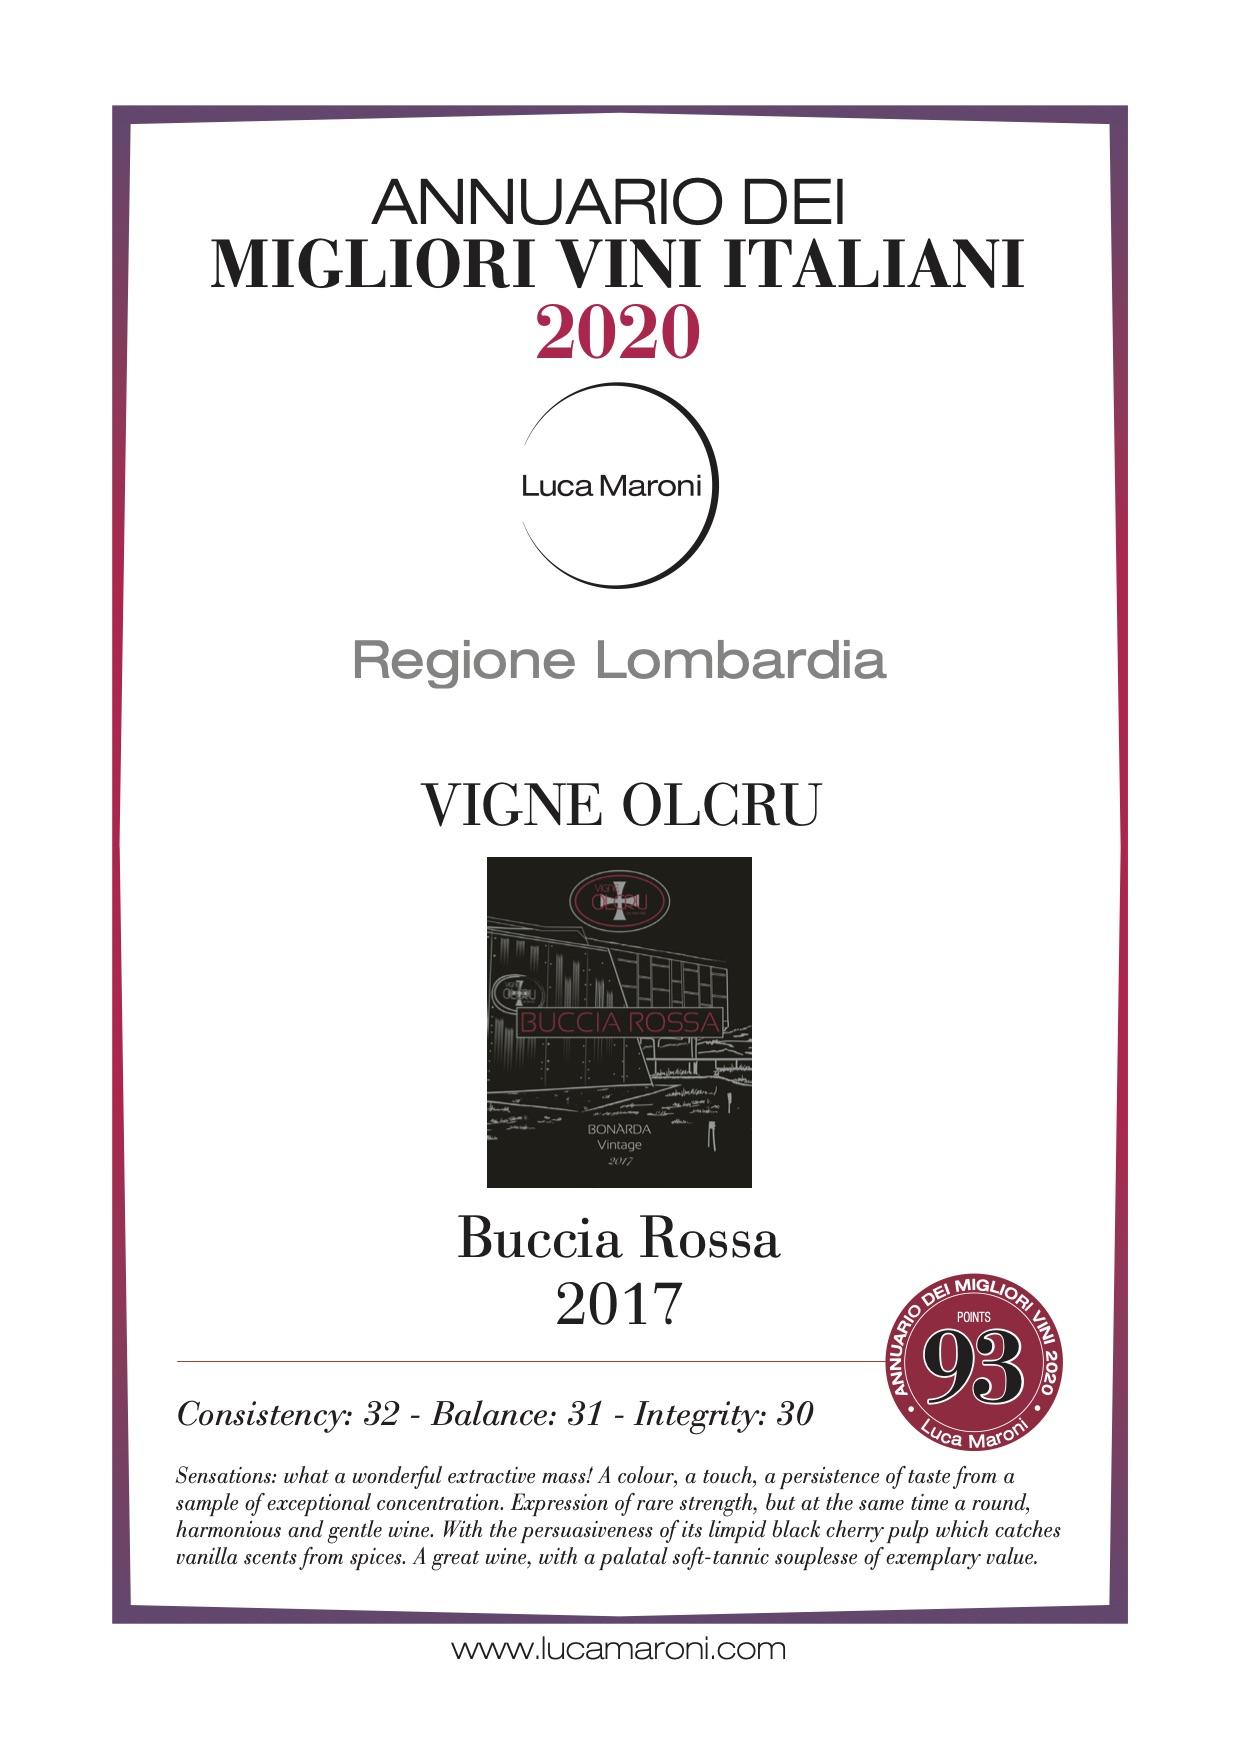 Luca Maroni 2020 – Buccia Rossa 2017 eng